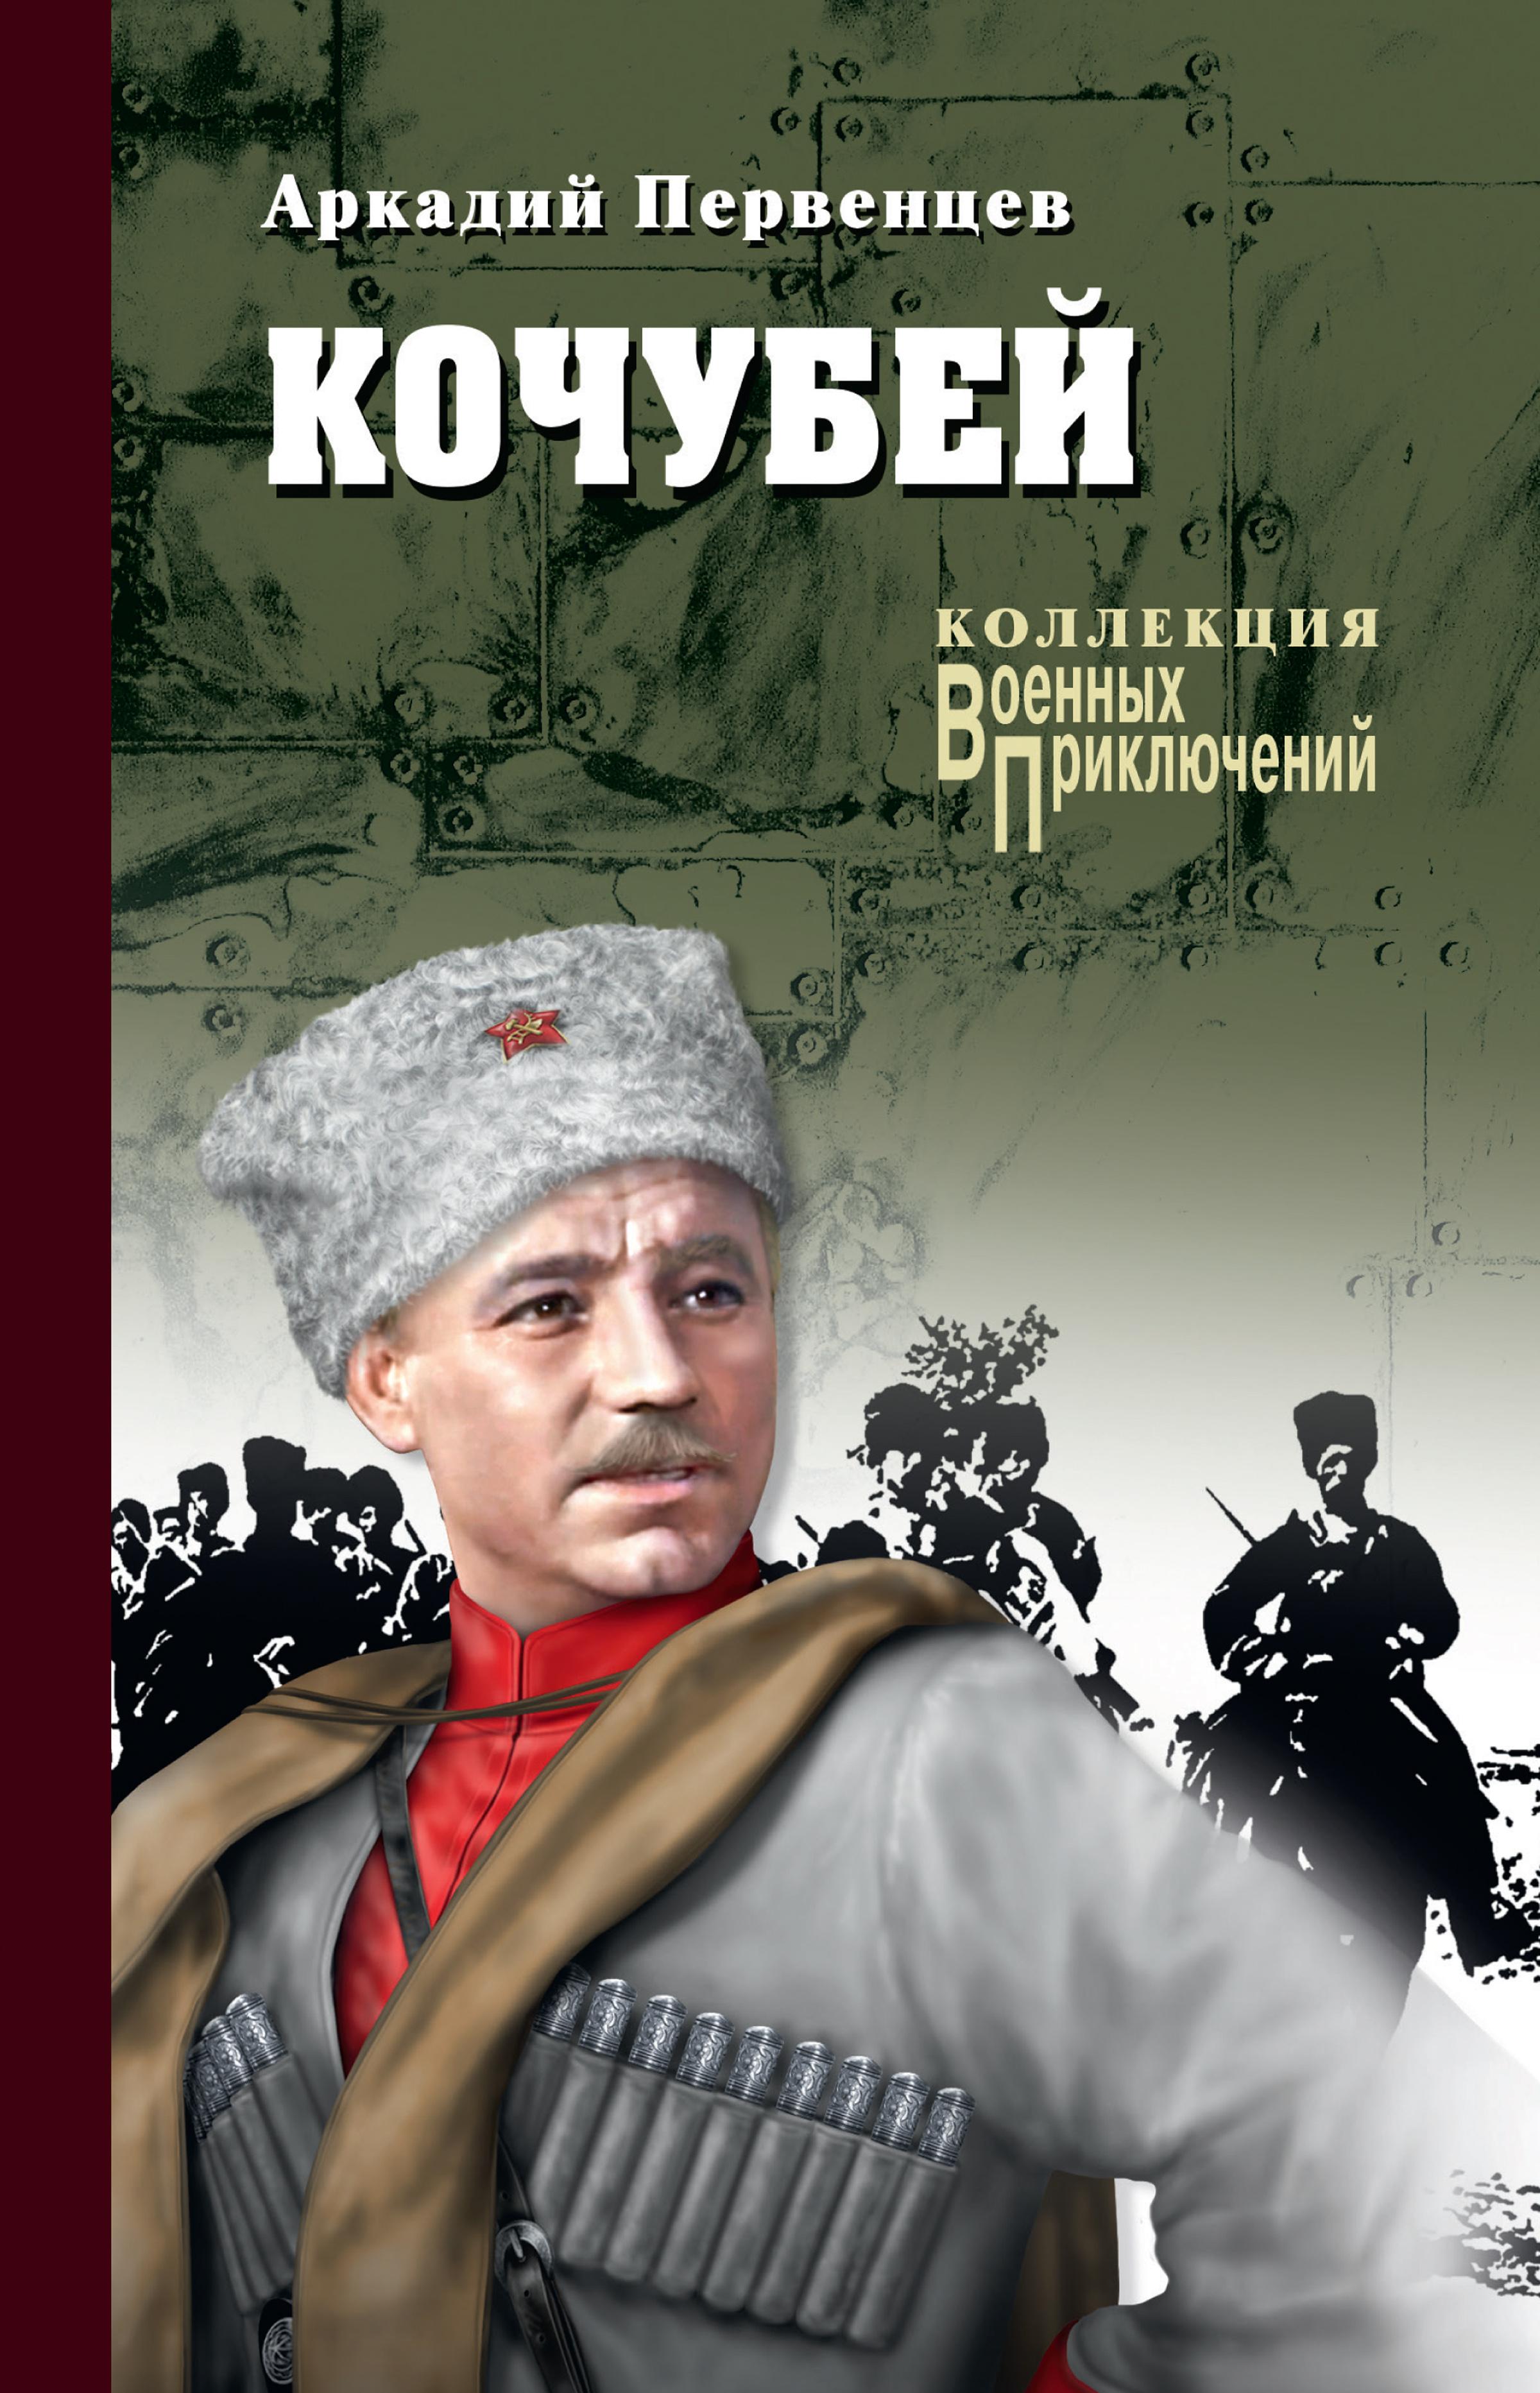 Аркадий Первенцев Кочубей аркадий первенцев кочубей